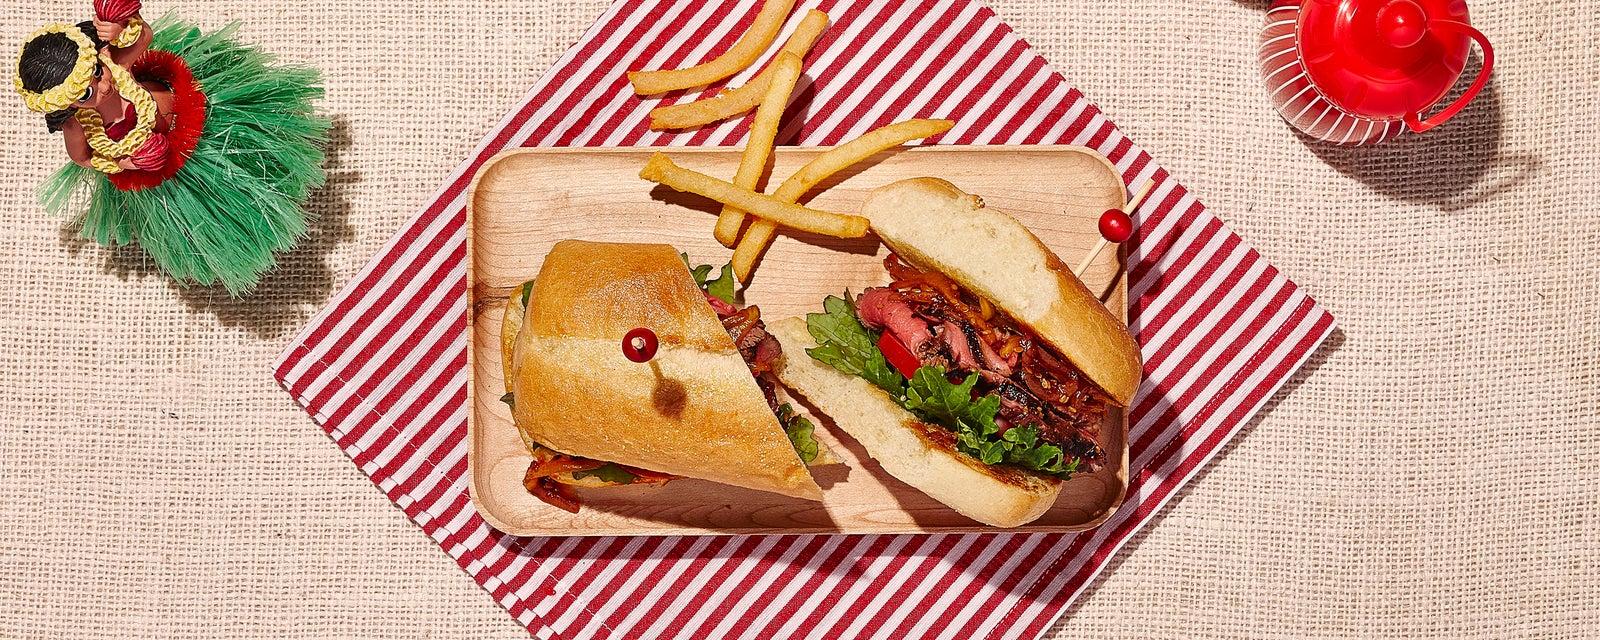 Veri Veri Steak Sandwich from Polker's